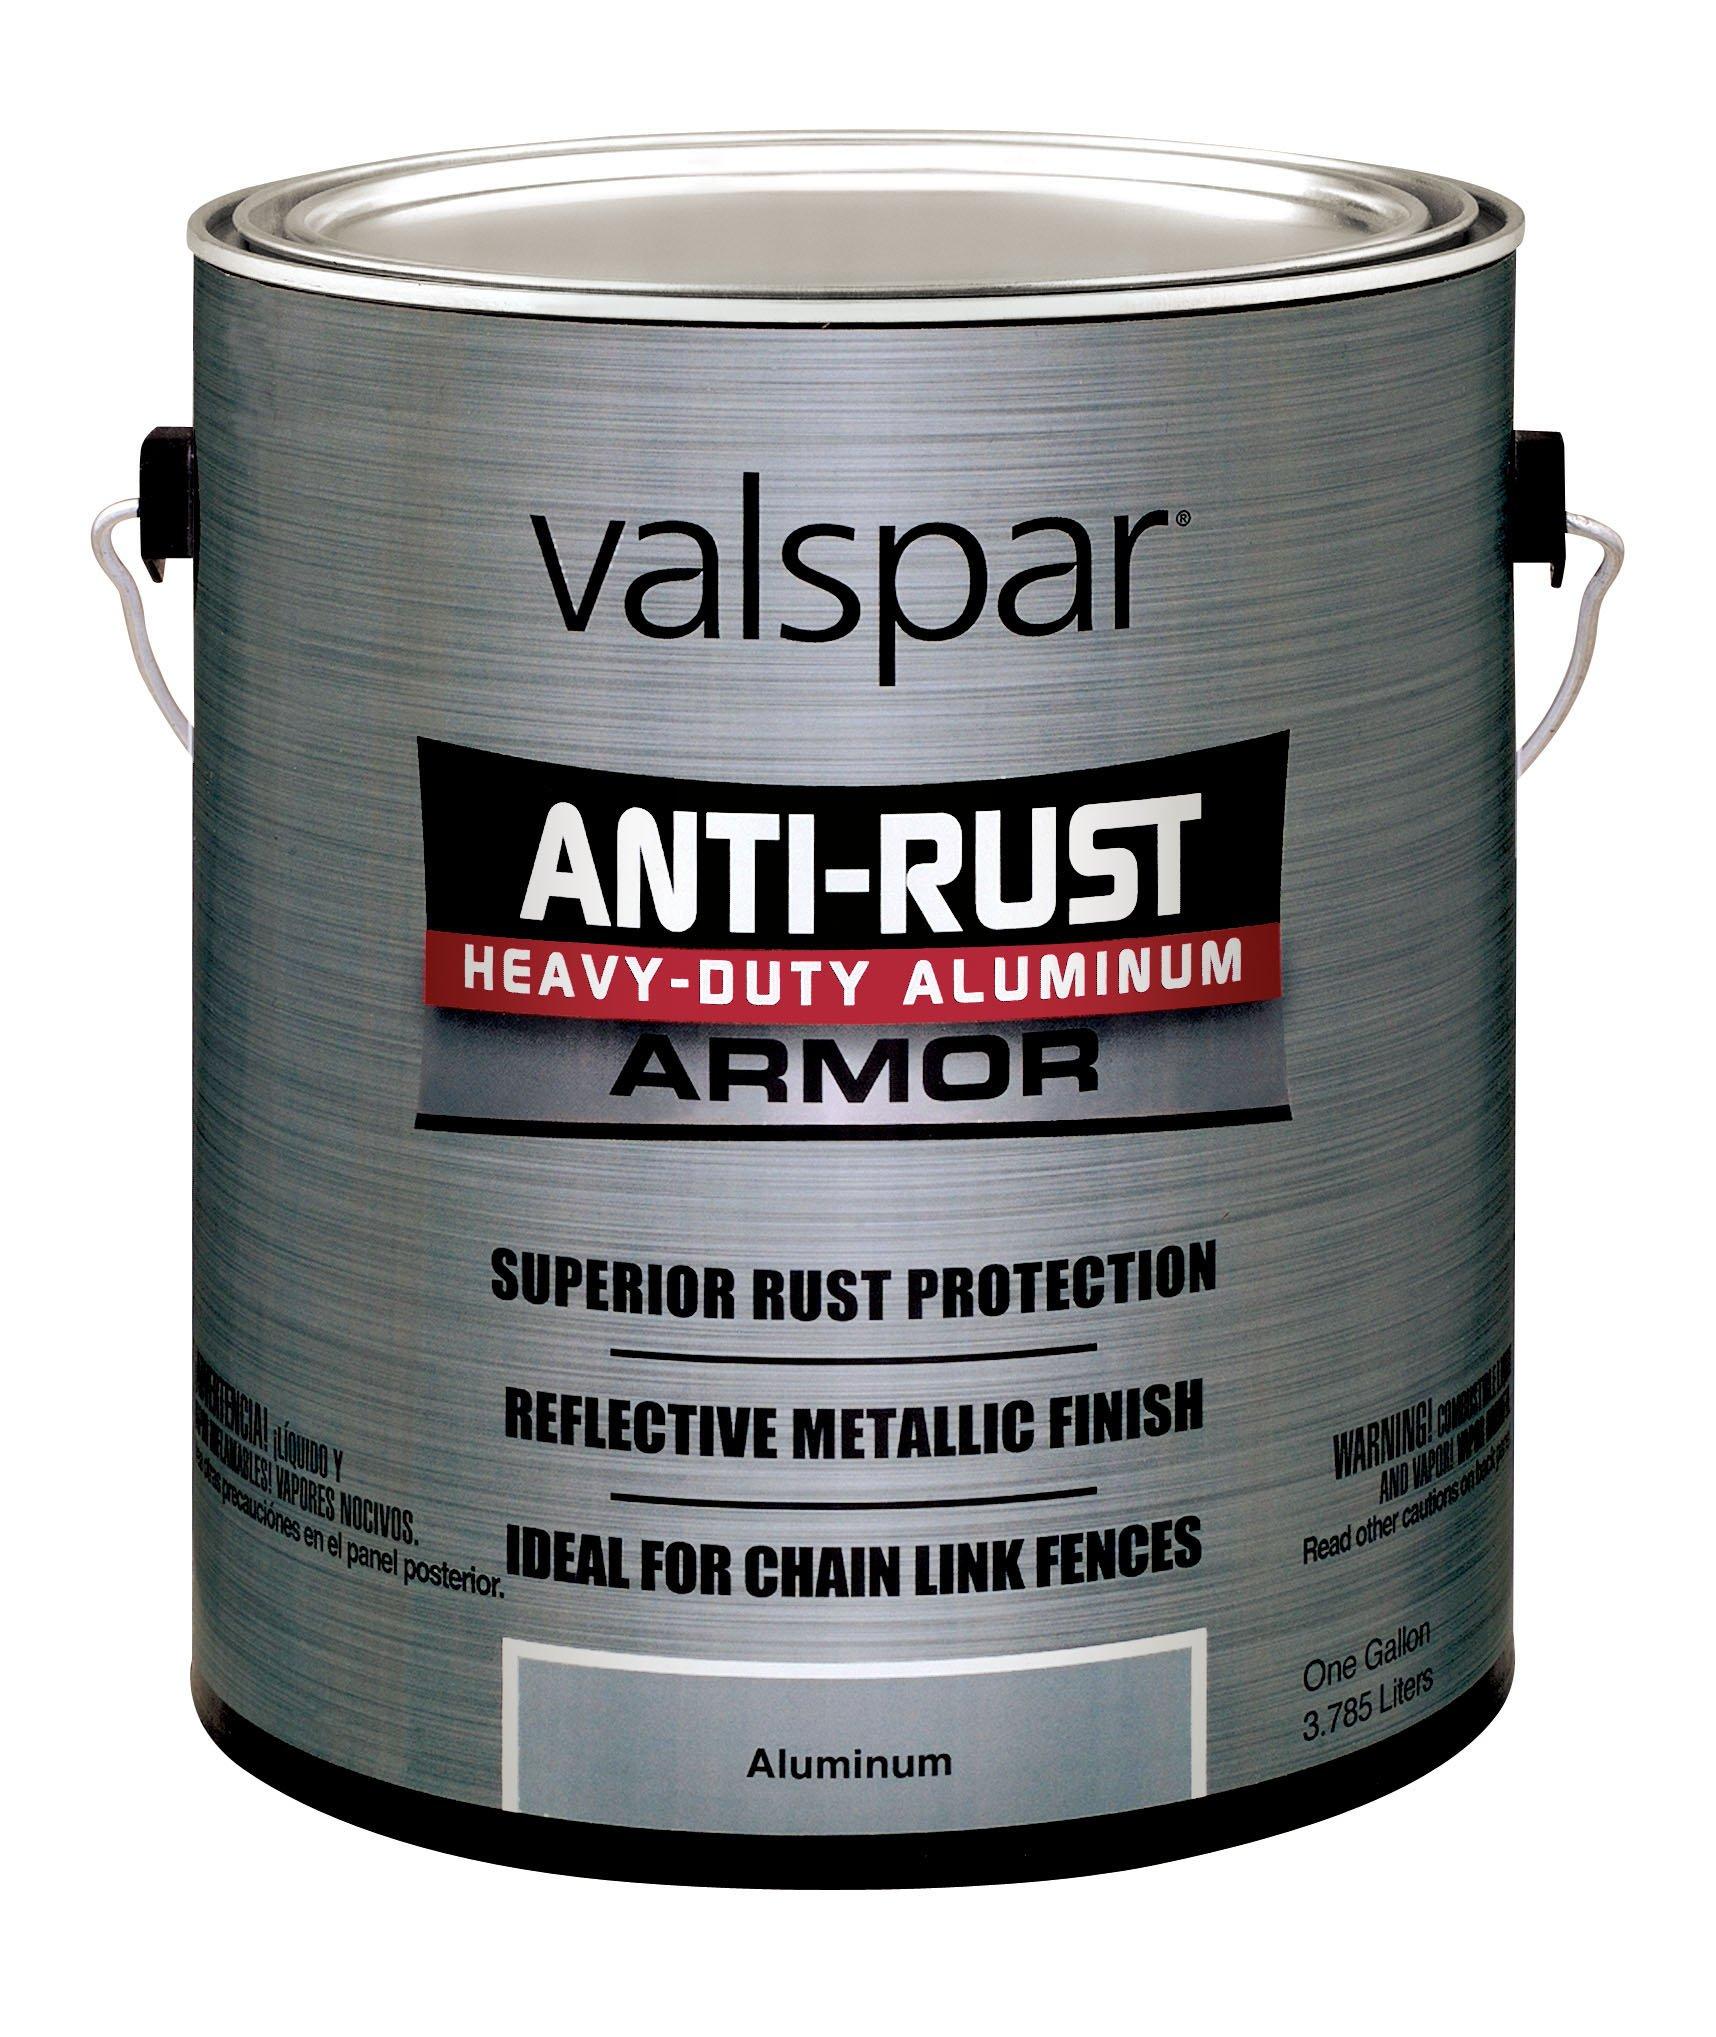 Valspar (21840G-2PK) Aluminum Heavy Duty Enamel - 1 Gallon, (Pack of 2)